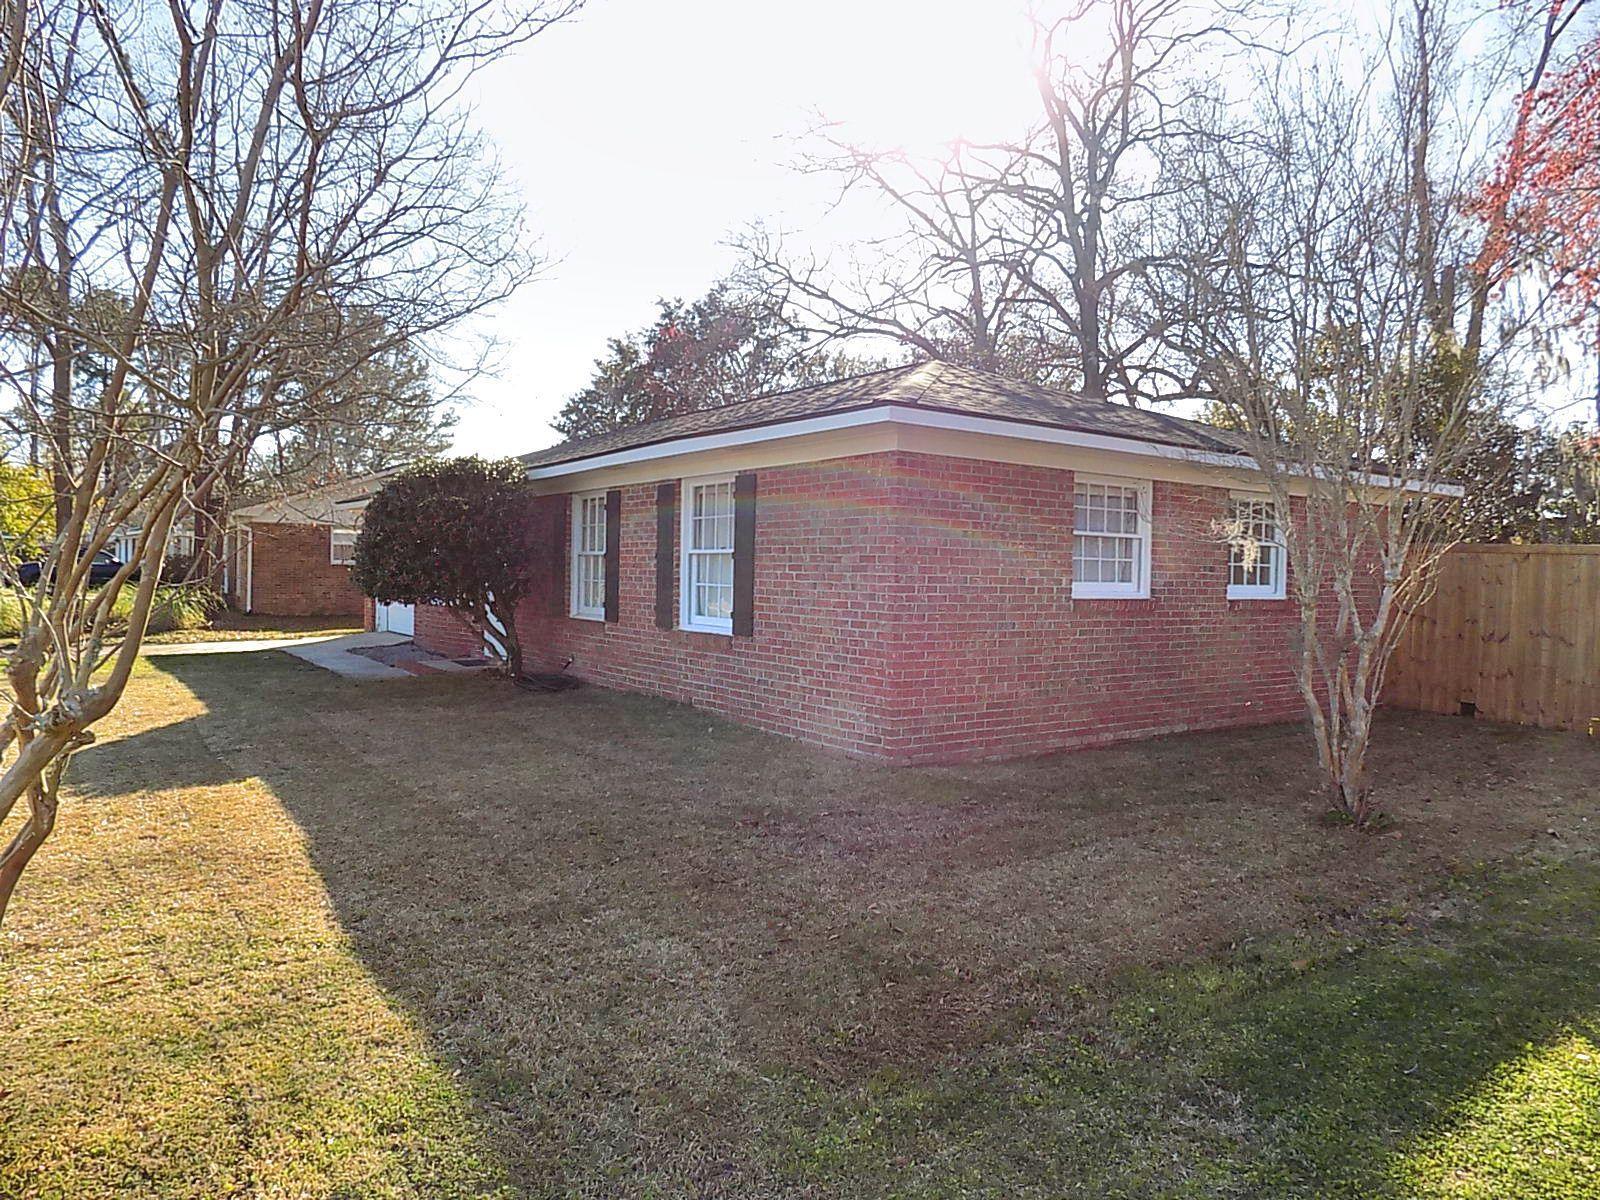 West Ashley Plantation Homes For Sale - 1720 Boone Hall, Charleston, SC - 23